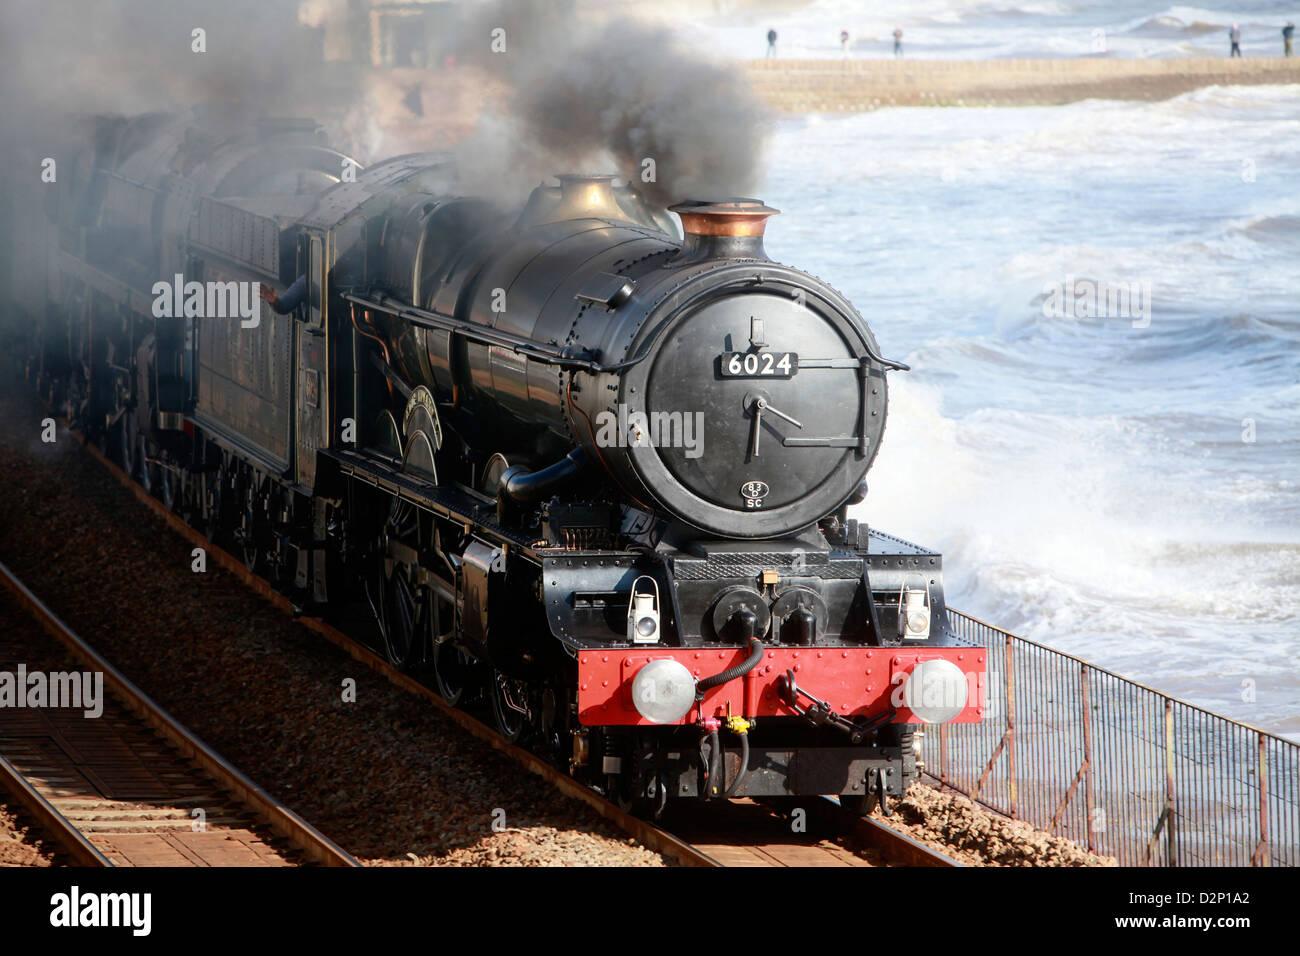 A vintage double header steam locomotive passes through Dawlish on the famous Brunel South Devon coastal railway - Stock Image